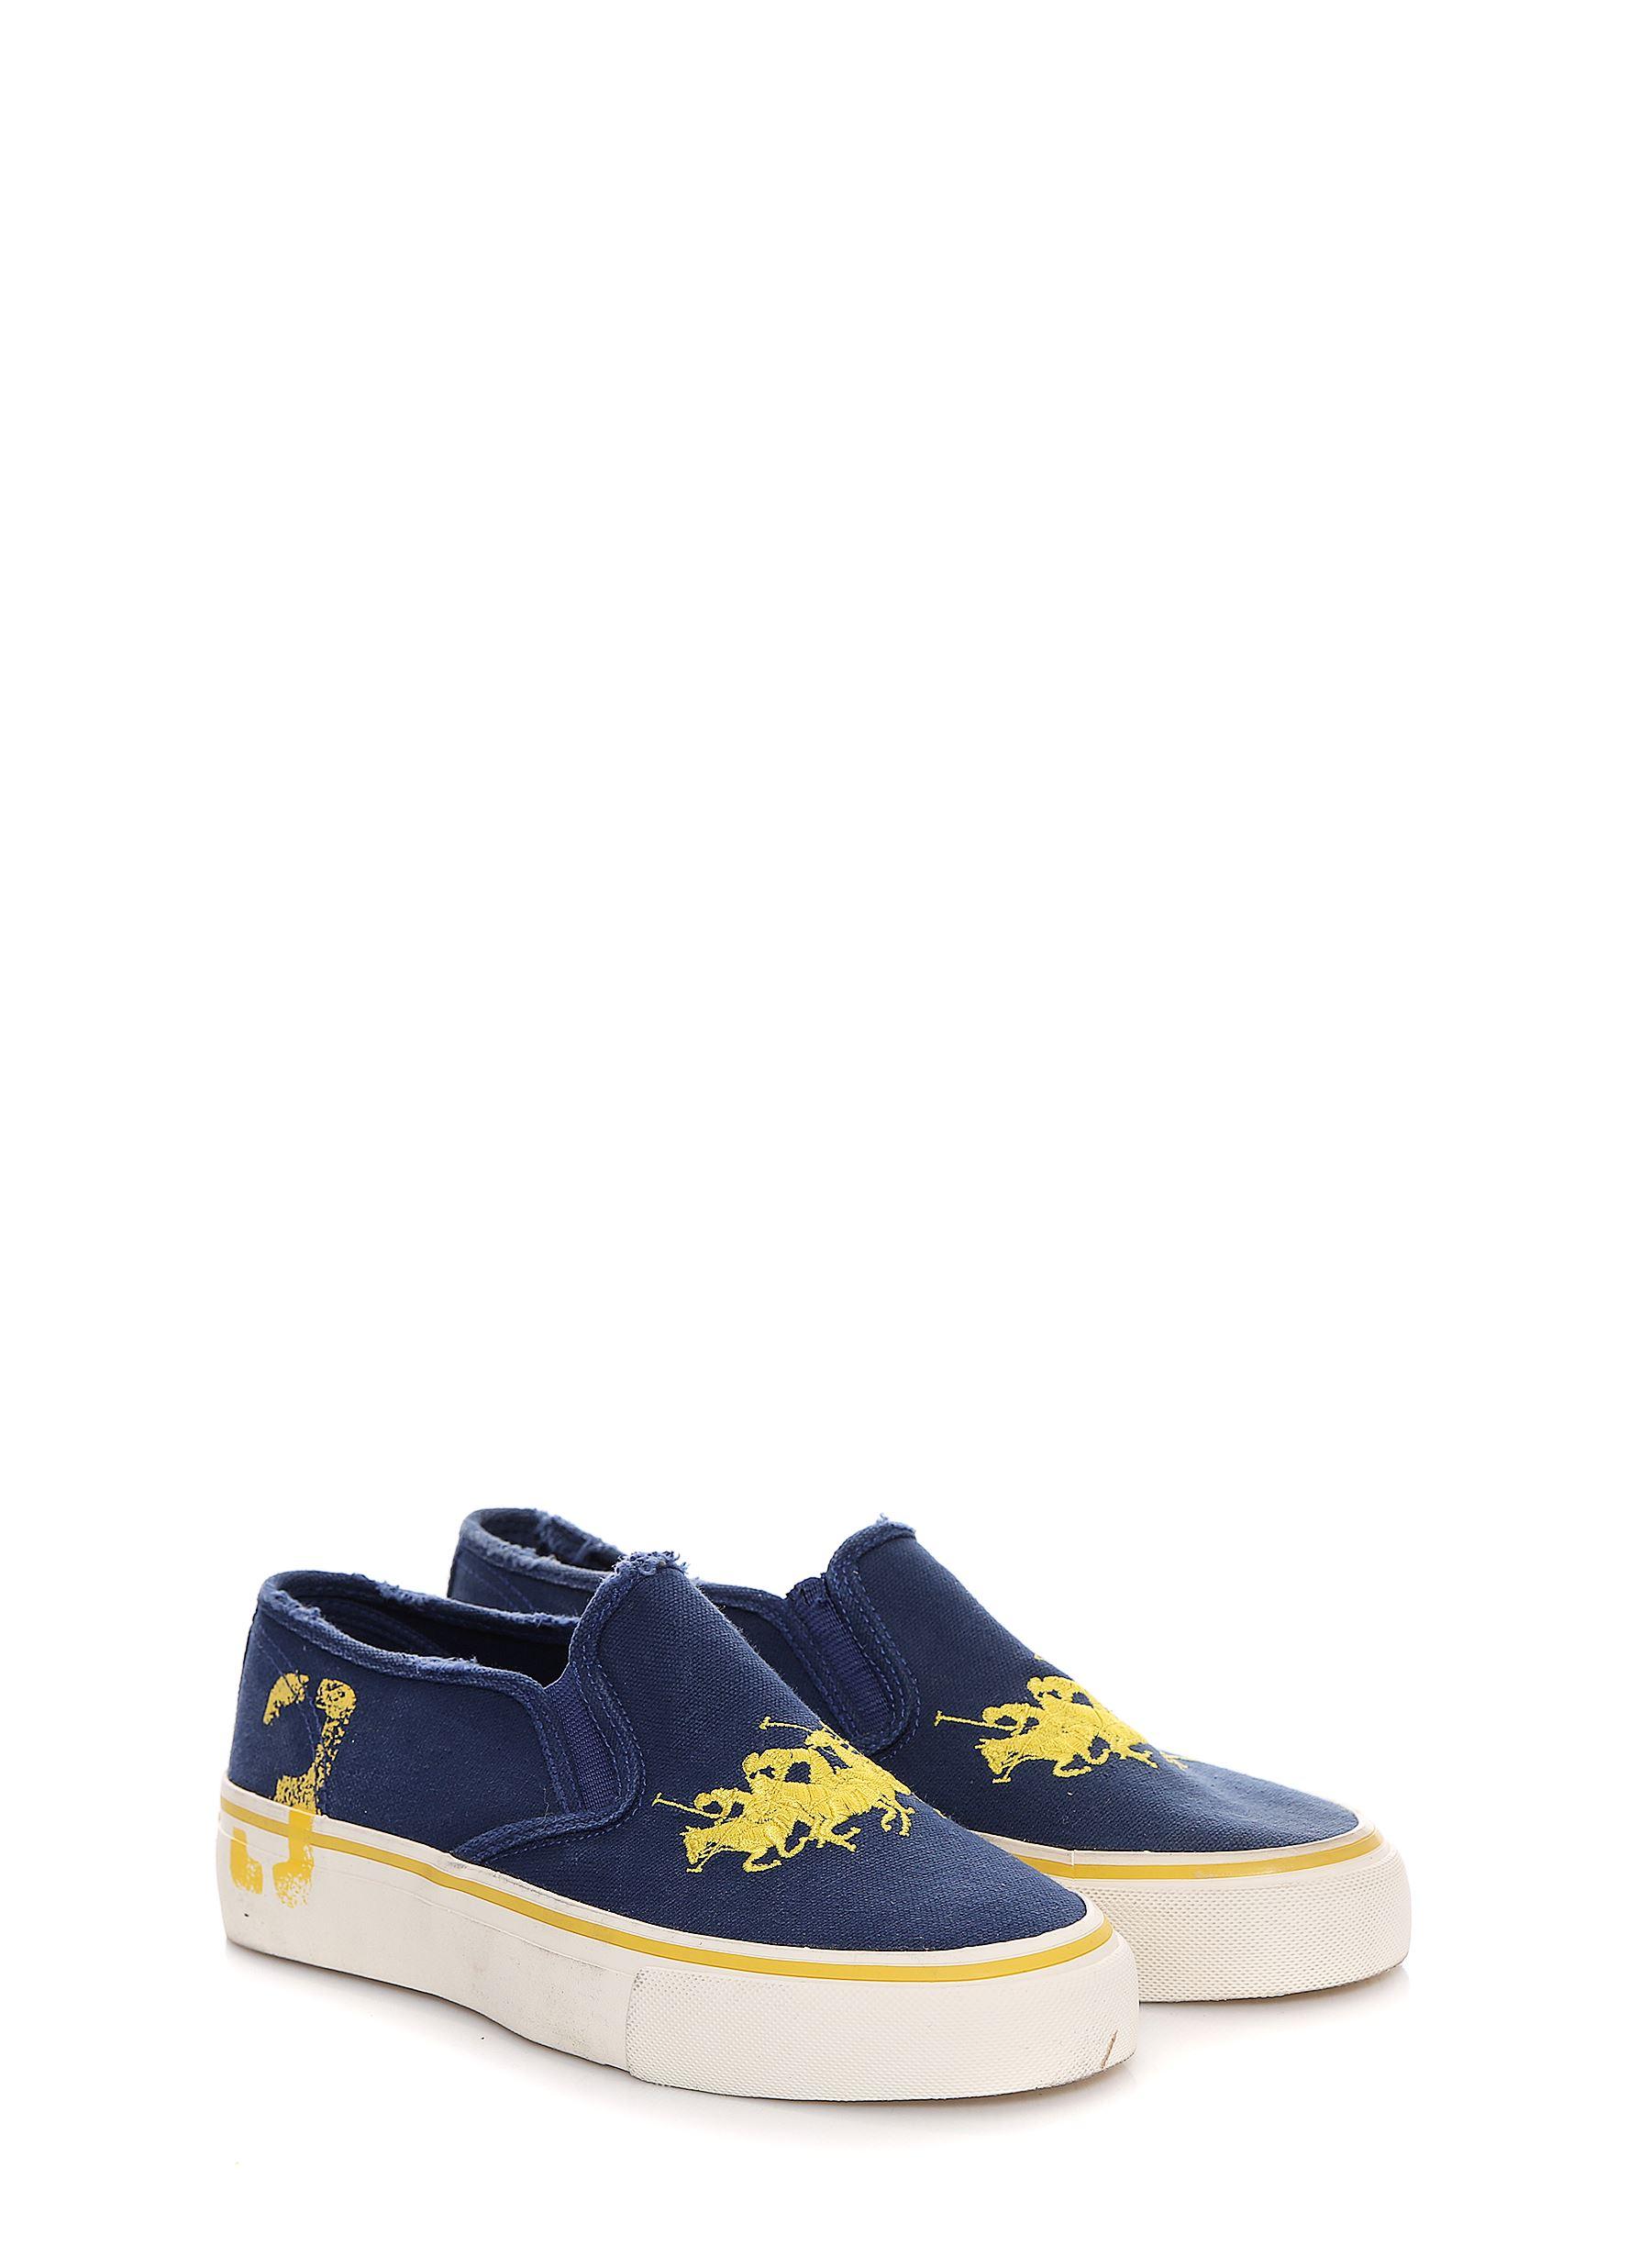 Walking Style - Ανδρικά Παπούτσια POLO RALPH LAUREN